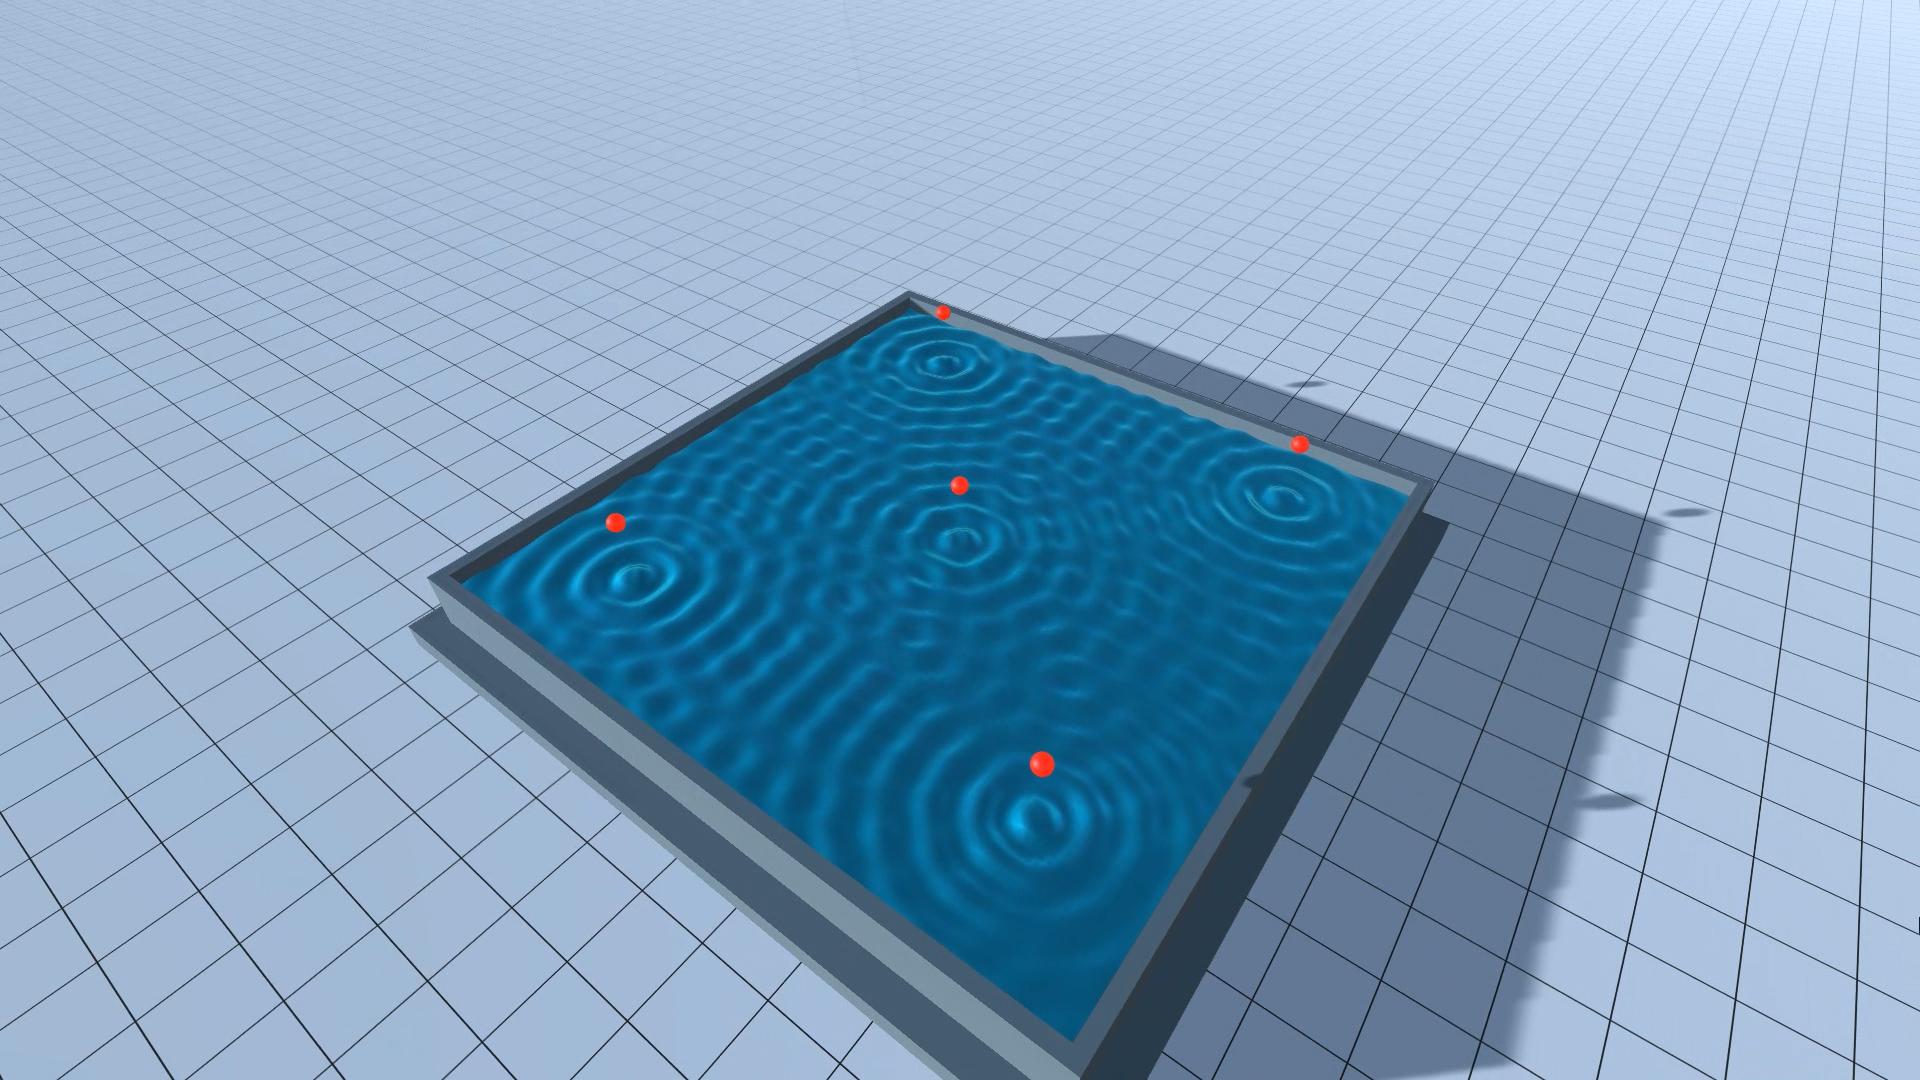 konsfik-procedural-water-surface-unity3d-snapshot-2